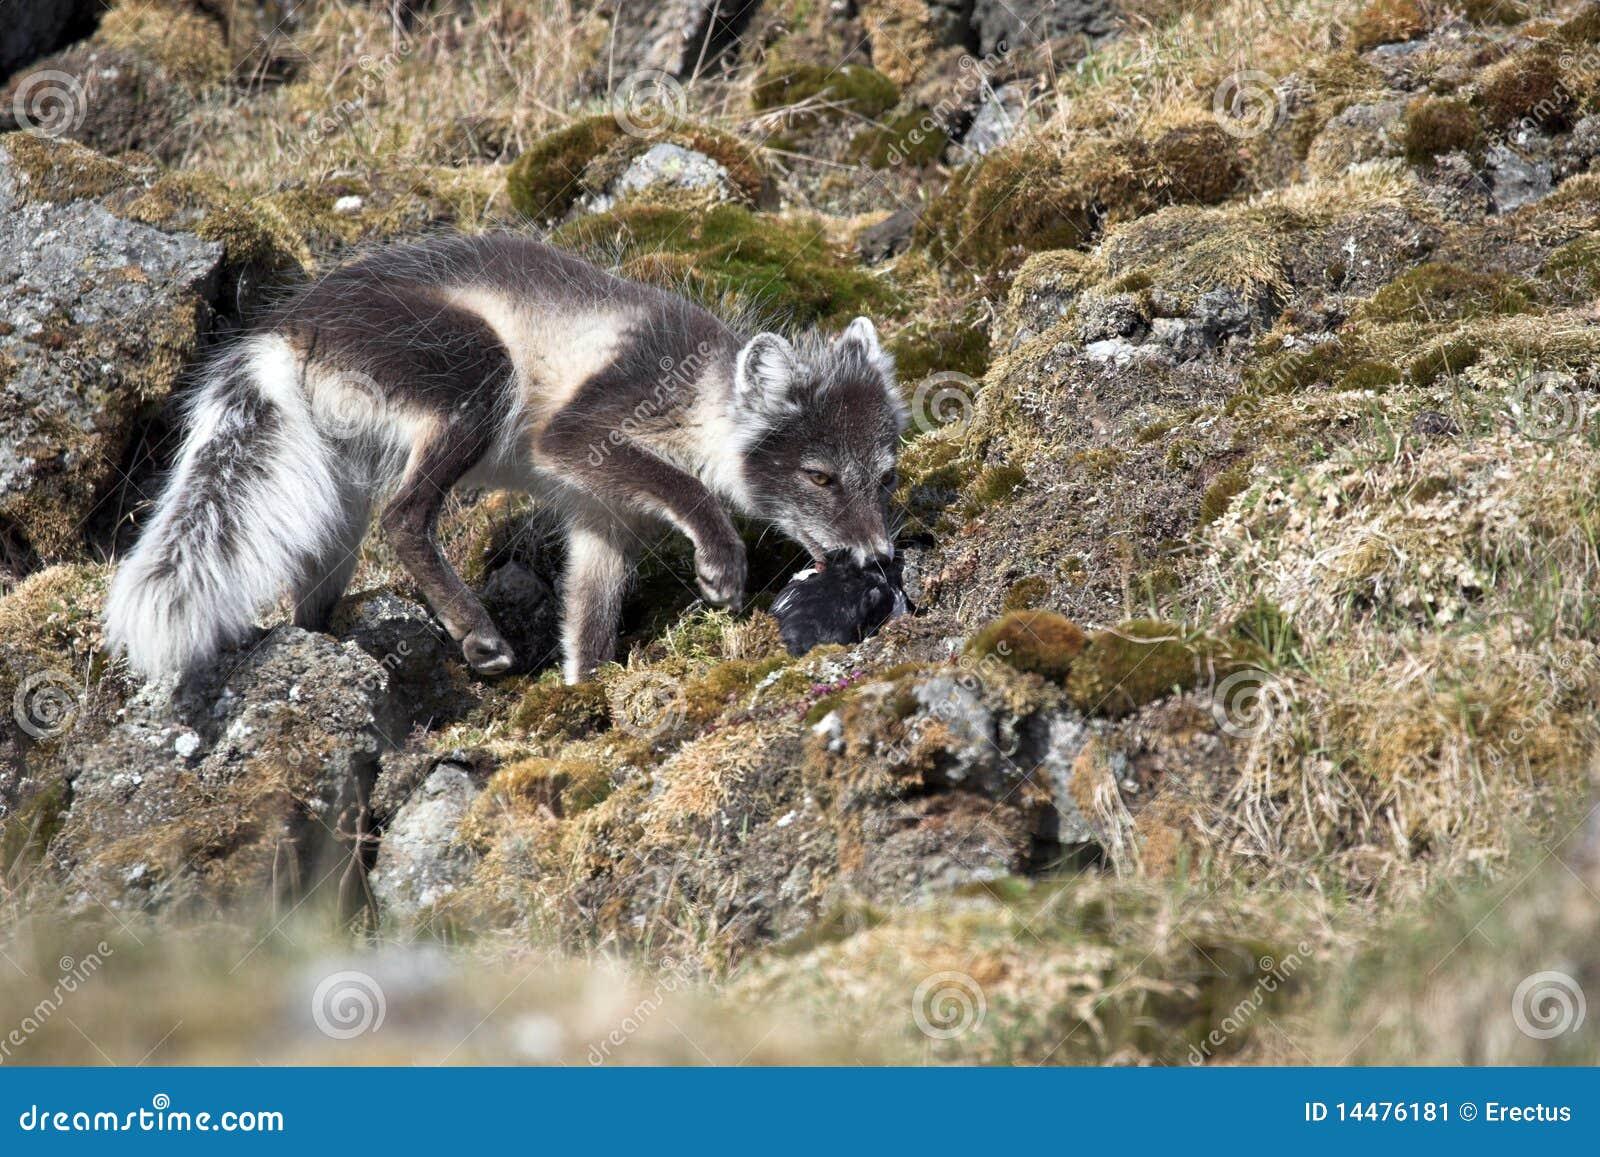 Arctic fox hunting for birds